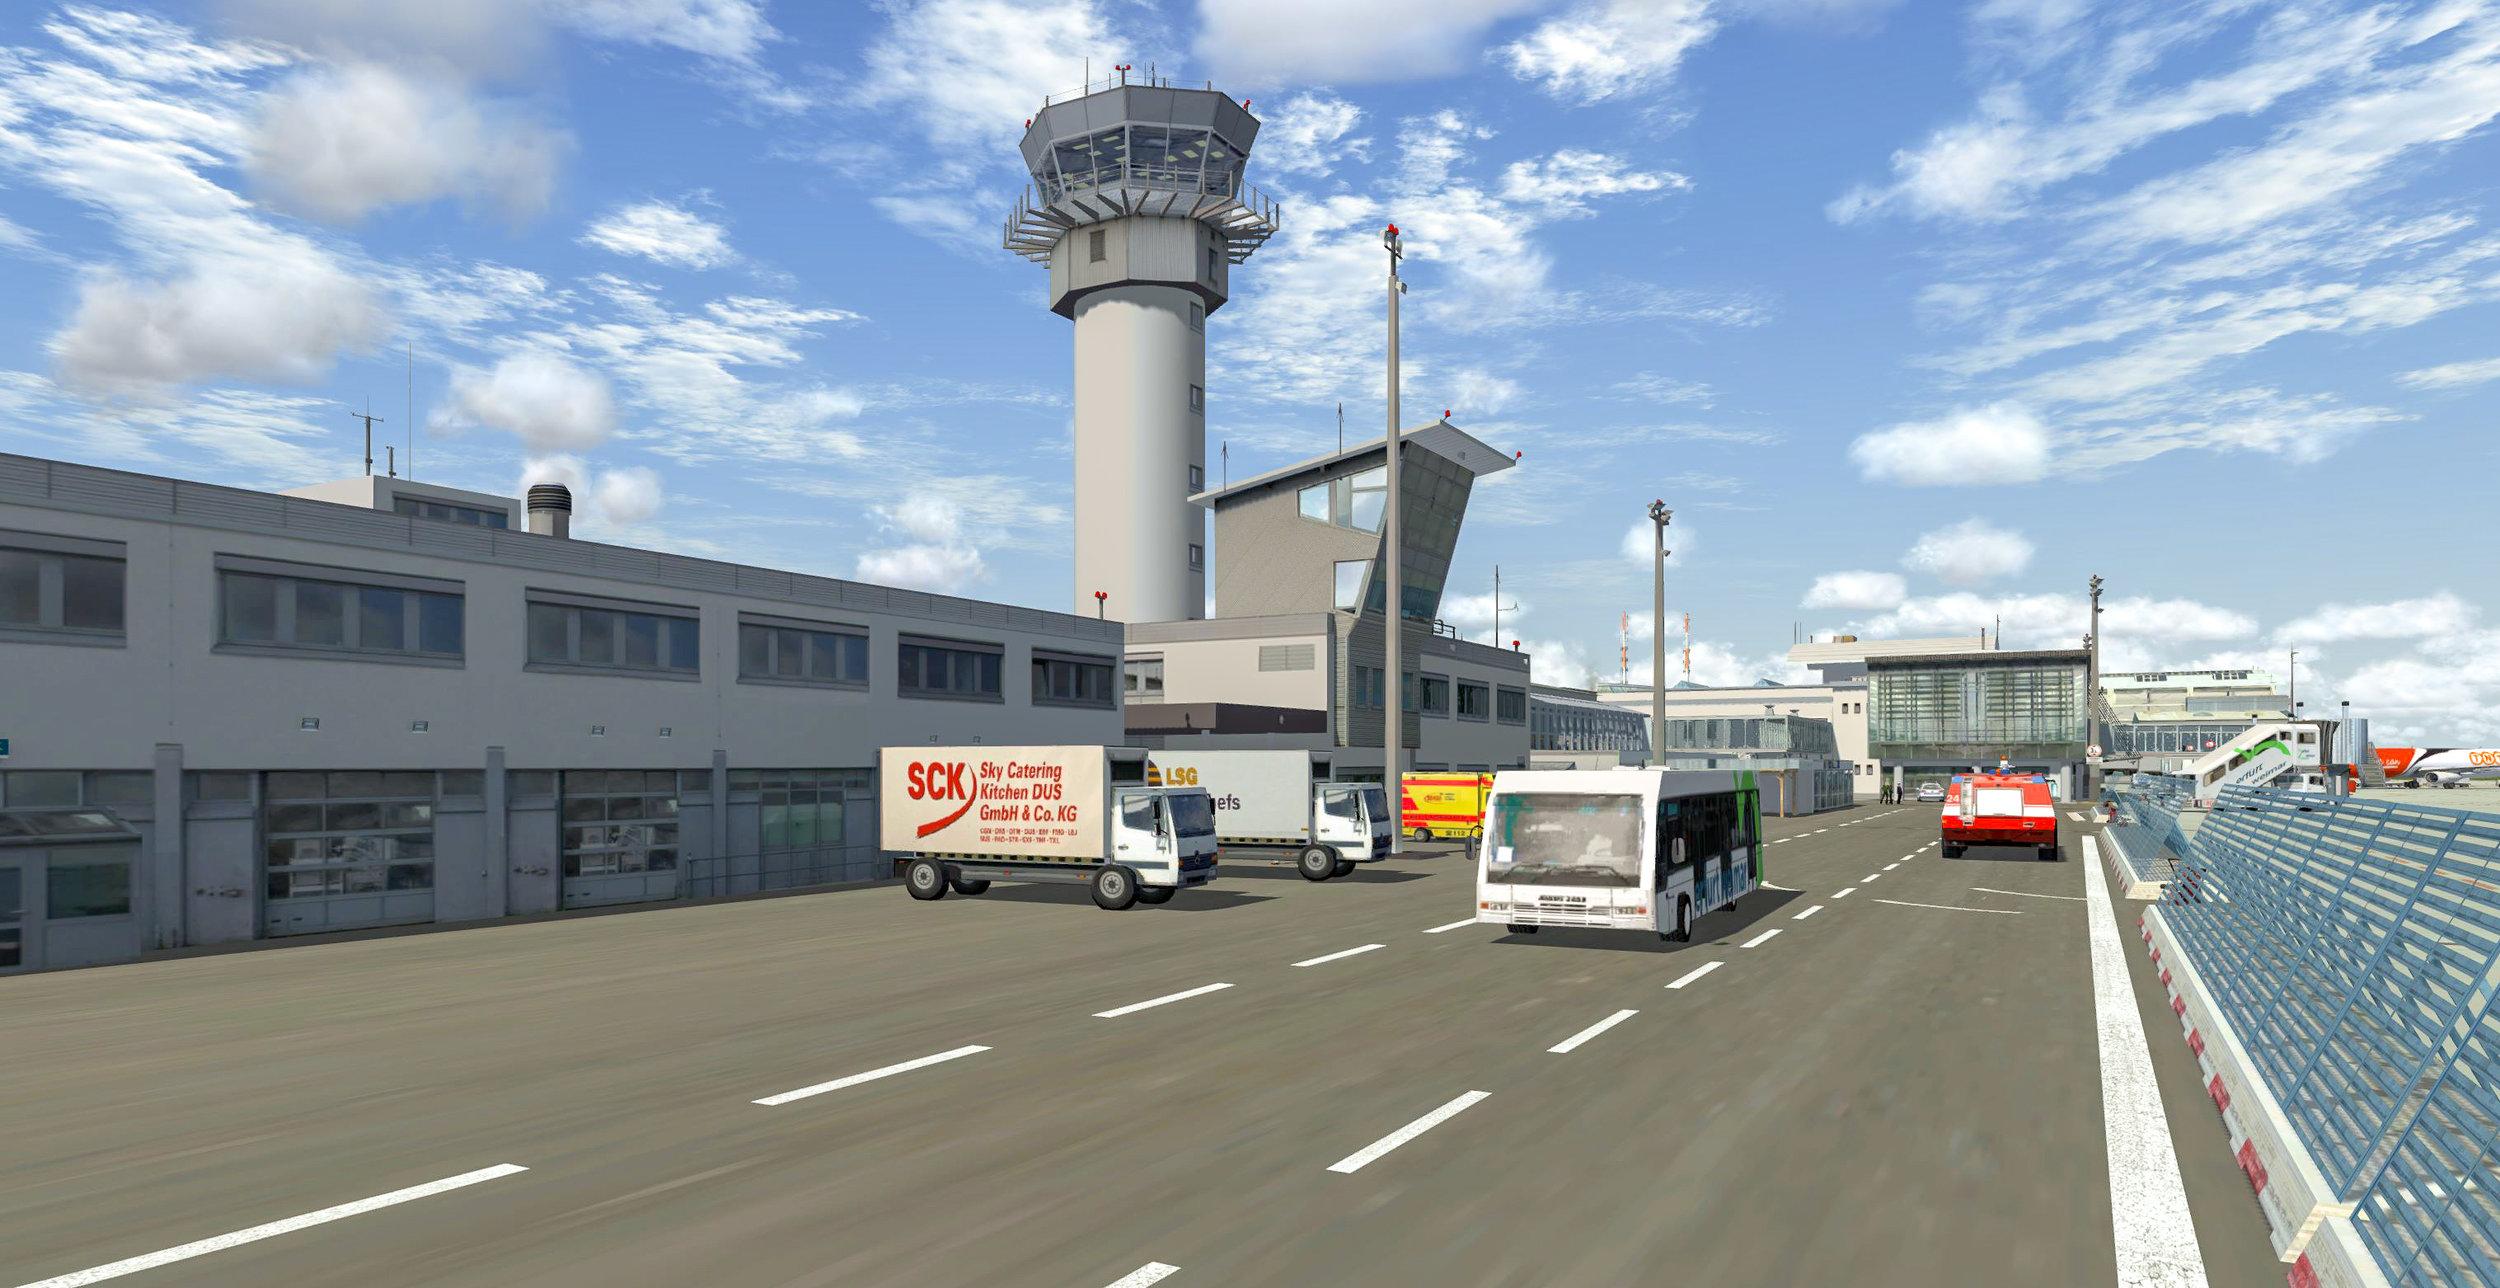 Airport_Erfurt_P3Dv4_13.jpg